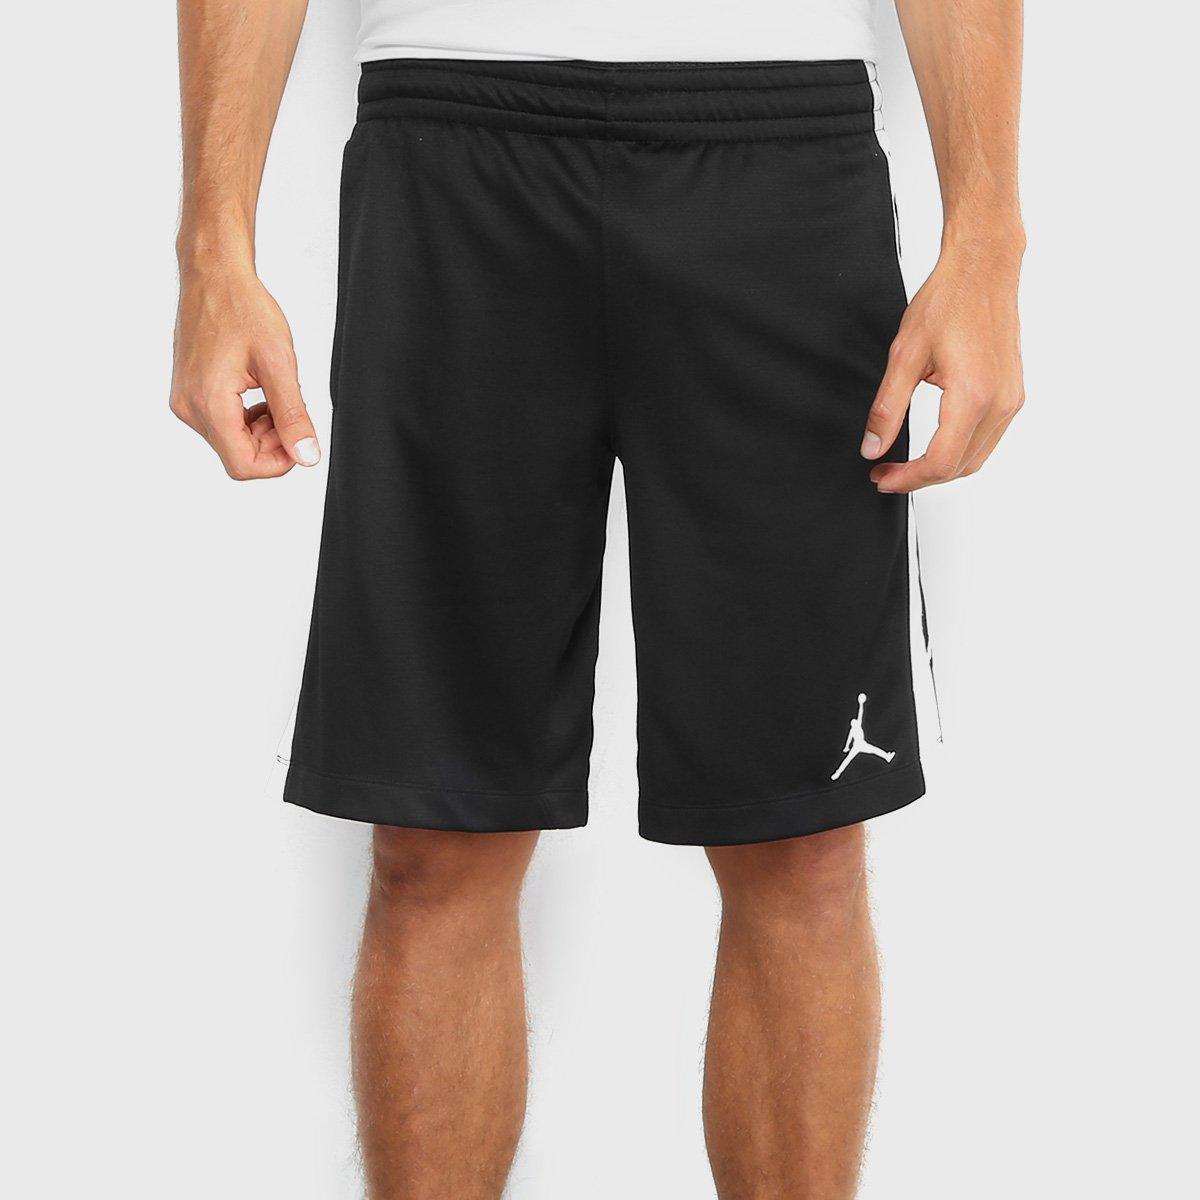 d6670638d58 Bermuda NBA Jordan Nike Flight Brand Masculina - Compre Agora